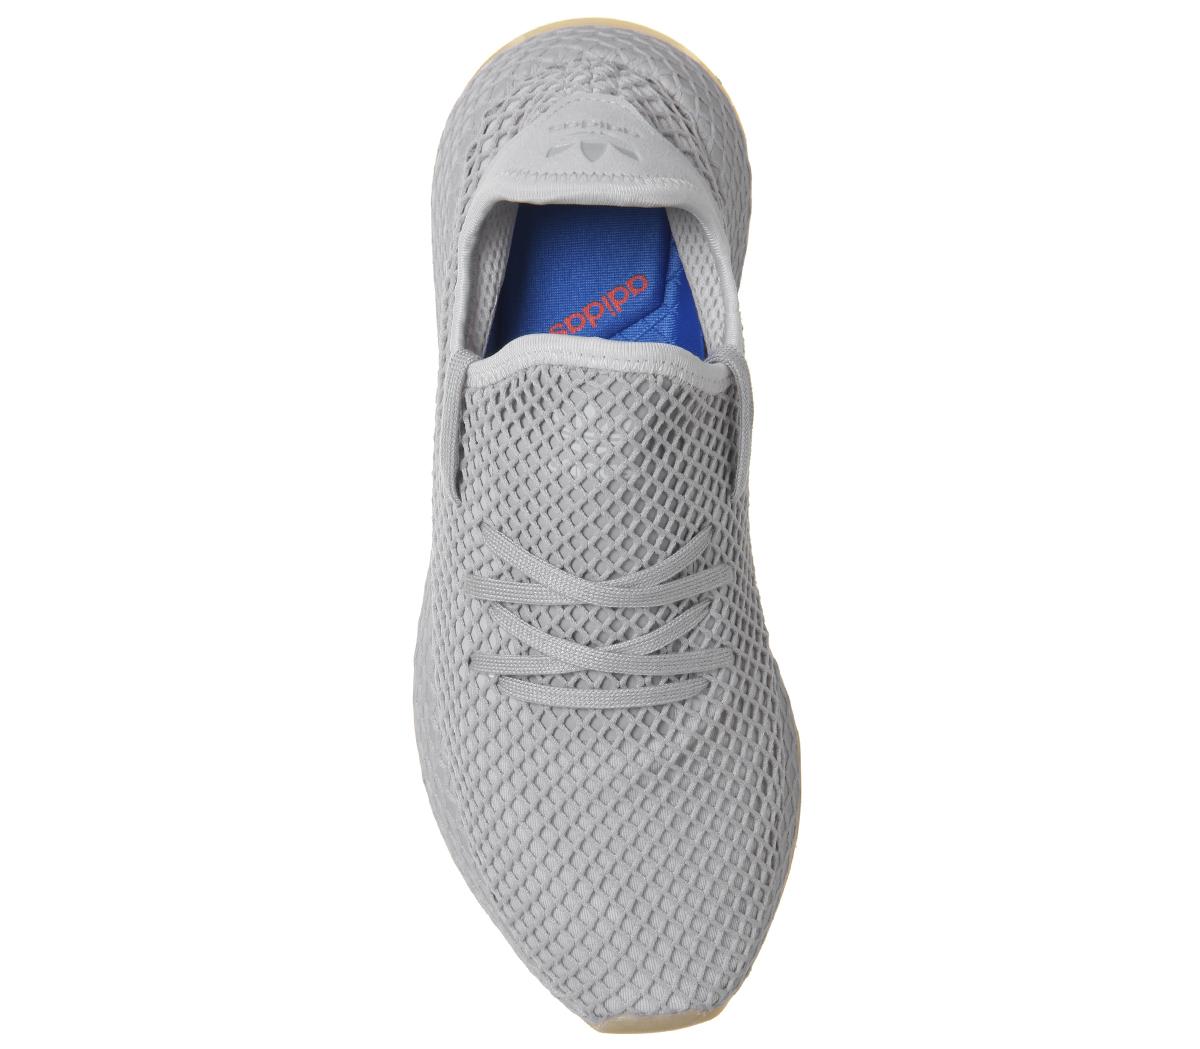 Wo Hommes Adidas Deerupt gris Trainers gris gris Deerupt GUM Trainers Chaussures 12f19d